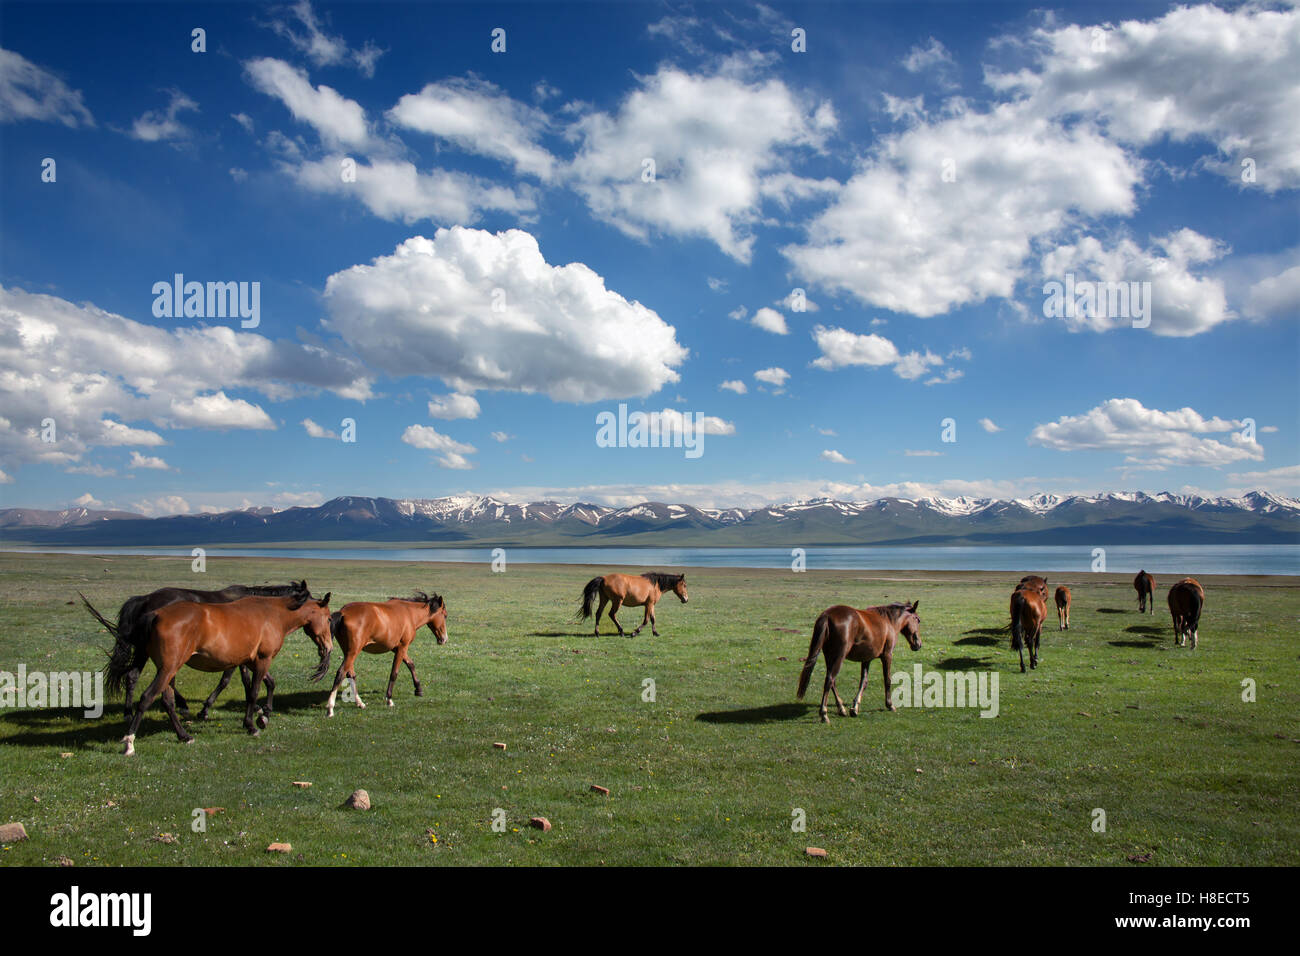 Kyrgyzstan - Horses at Song Kol lake -  Travel people Central Asia - Stock Image